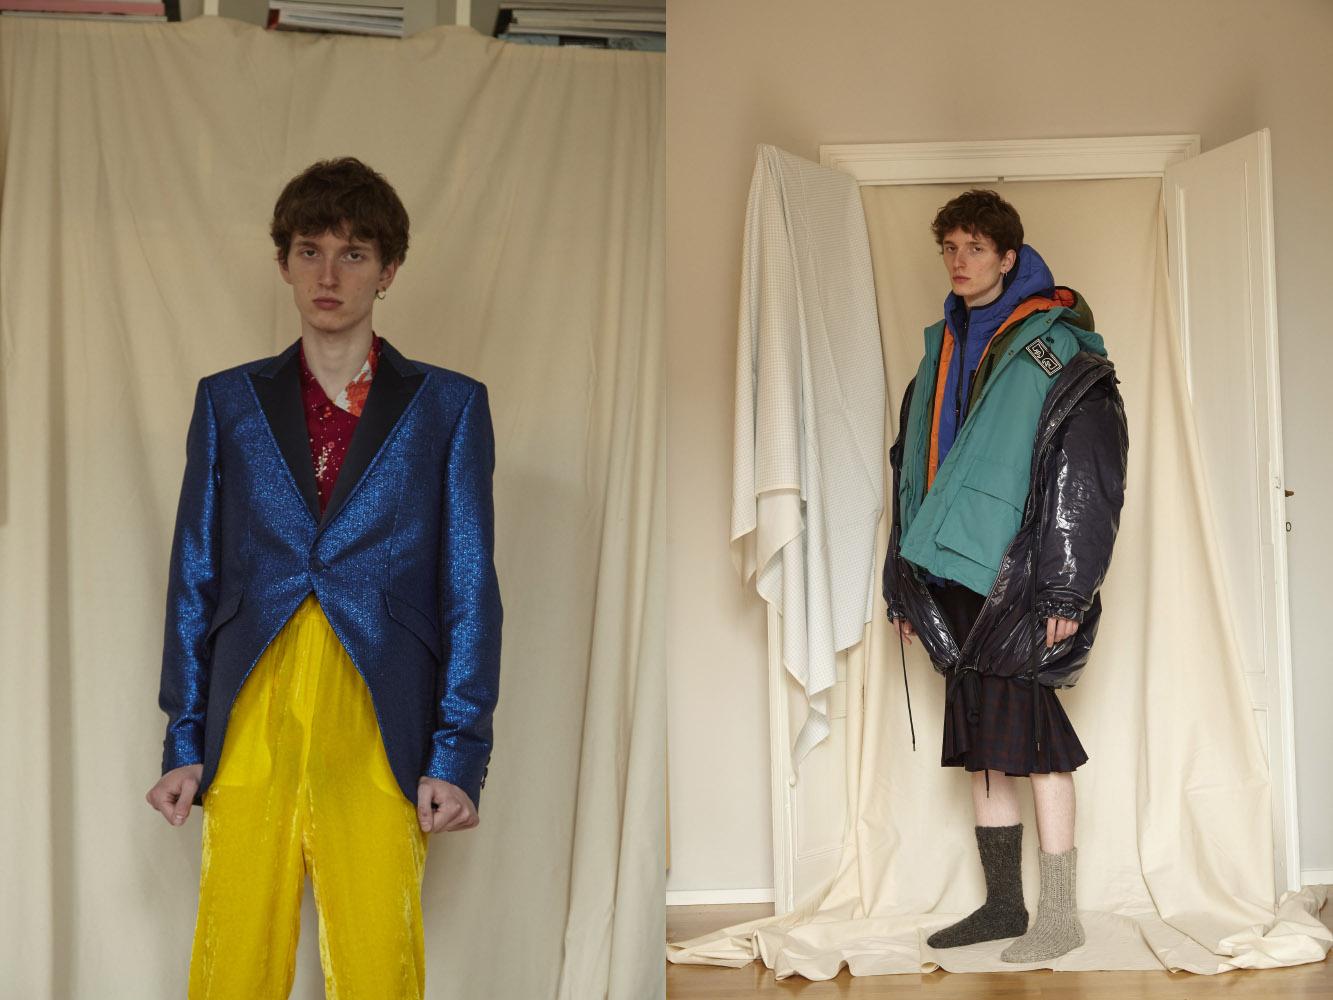 jacket  CARLO PIGNATELLI  shirt  HUF  pants  ATTIC AND BARN . blue/orange padded jacket  OOF WEAR  green bomber  OBEY  black padded jacket  ANDREA POMPILIO  skirt  WRAD